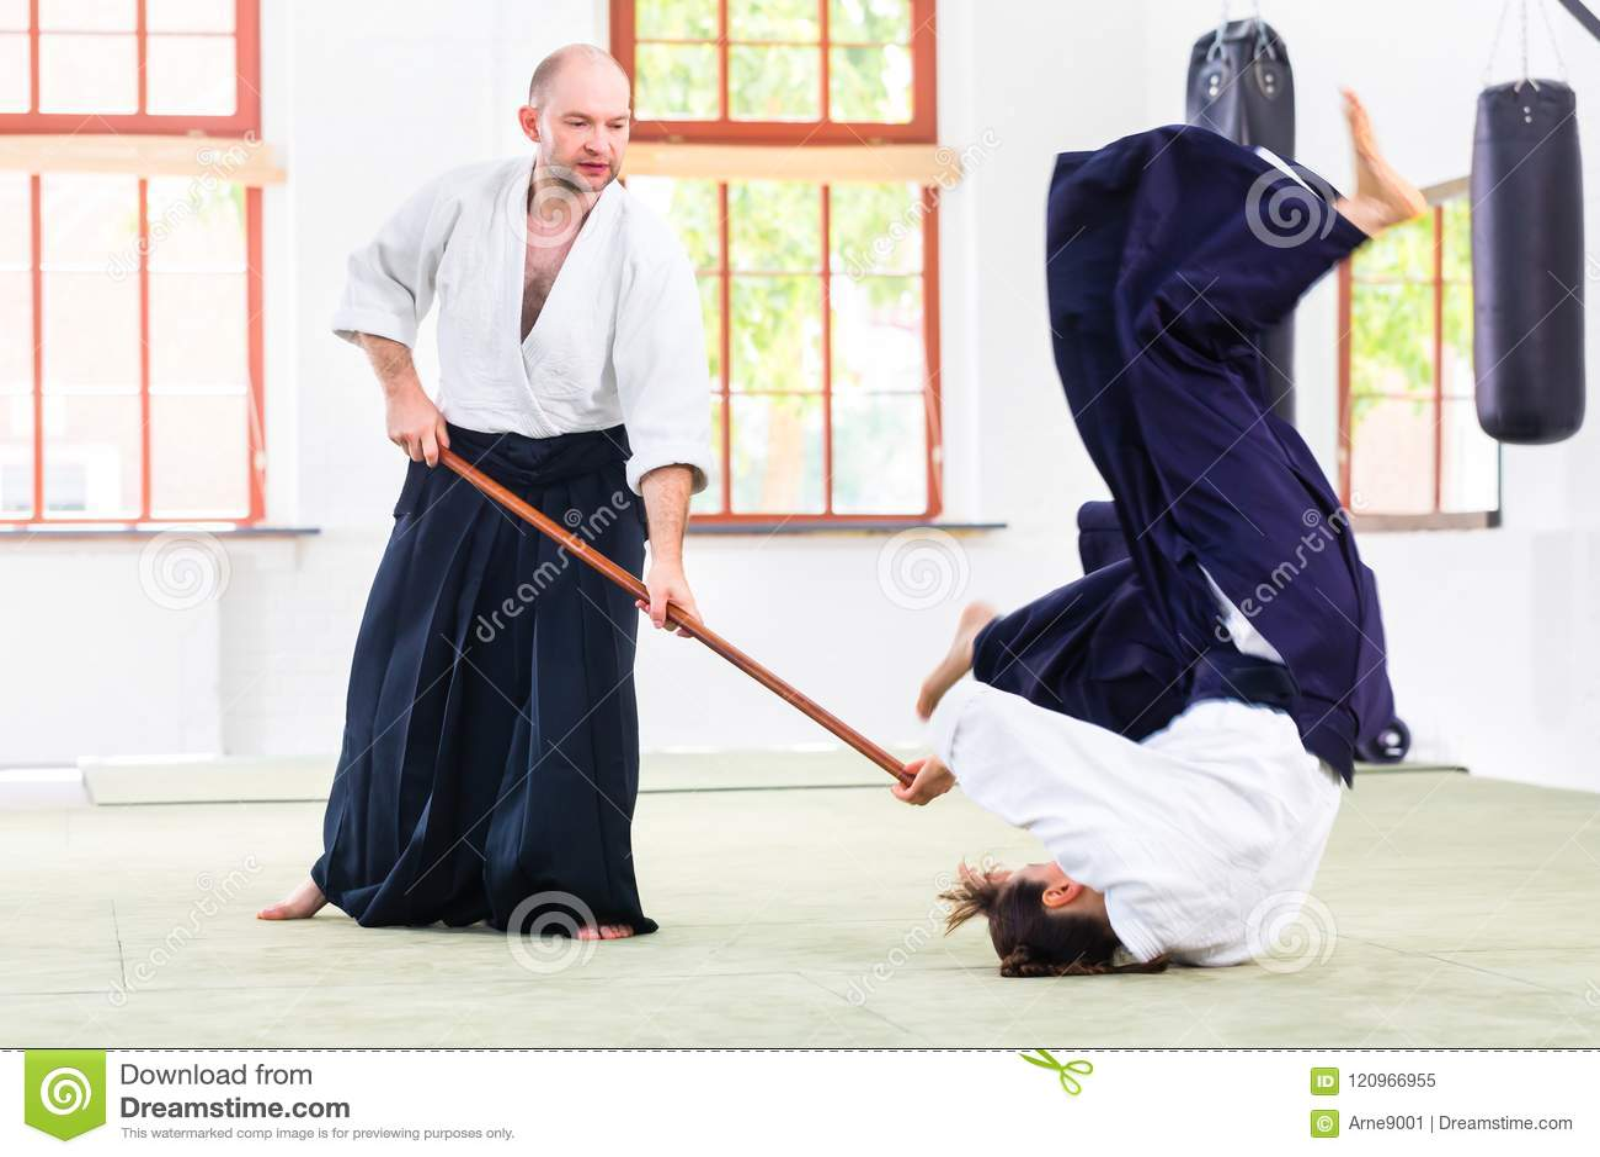 Man and woman having Aikido stick fight